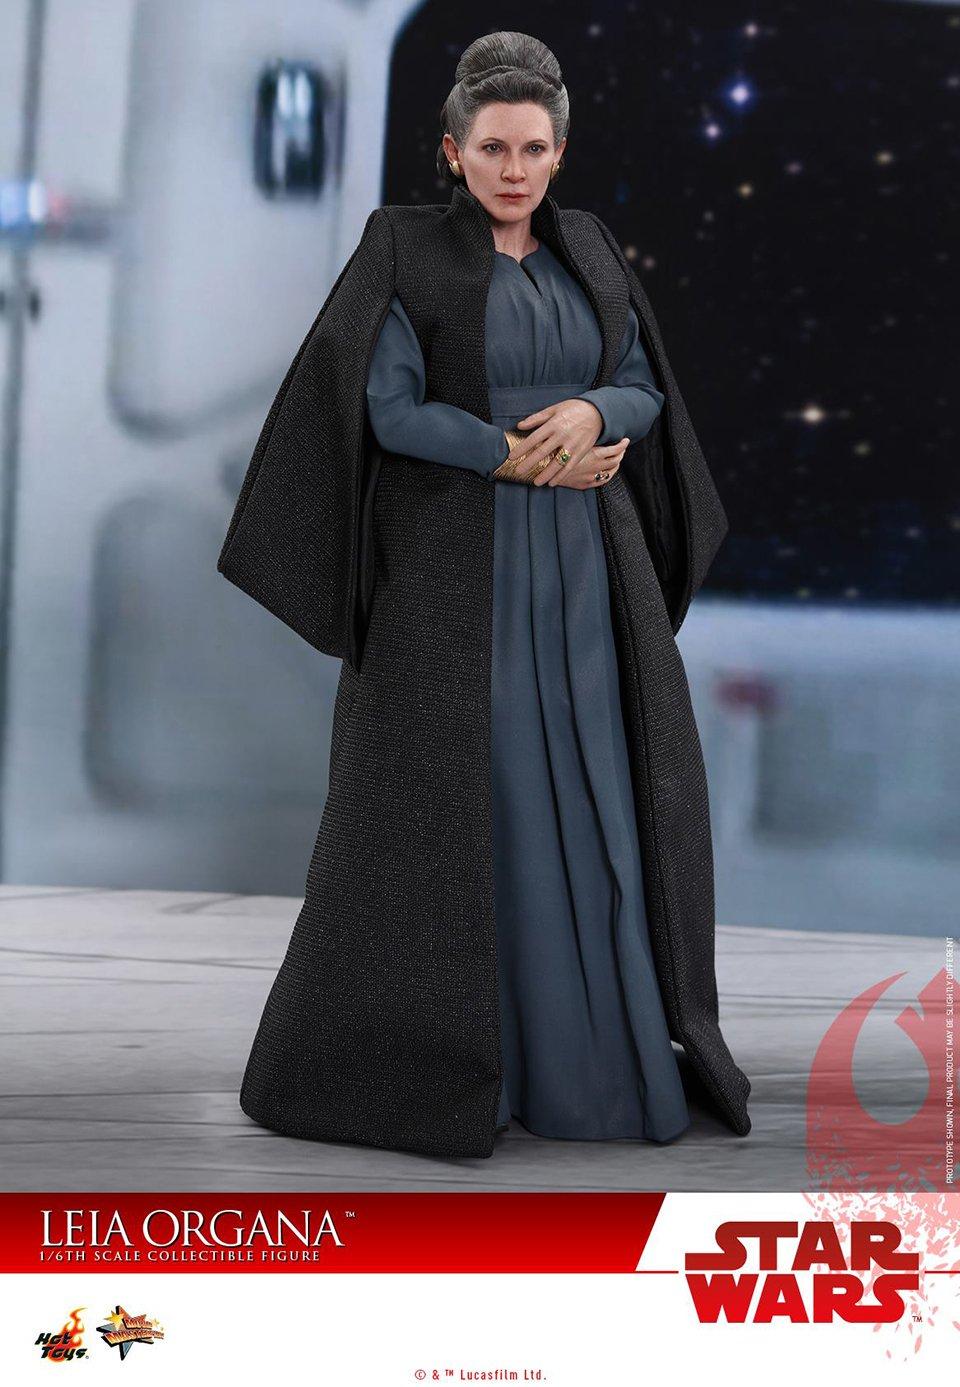 Hot Toys Leia Last Jedi Action Figure